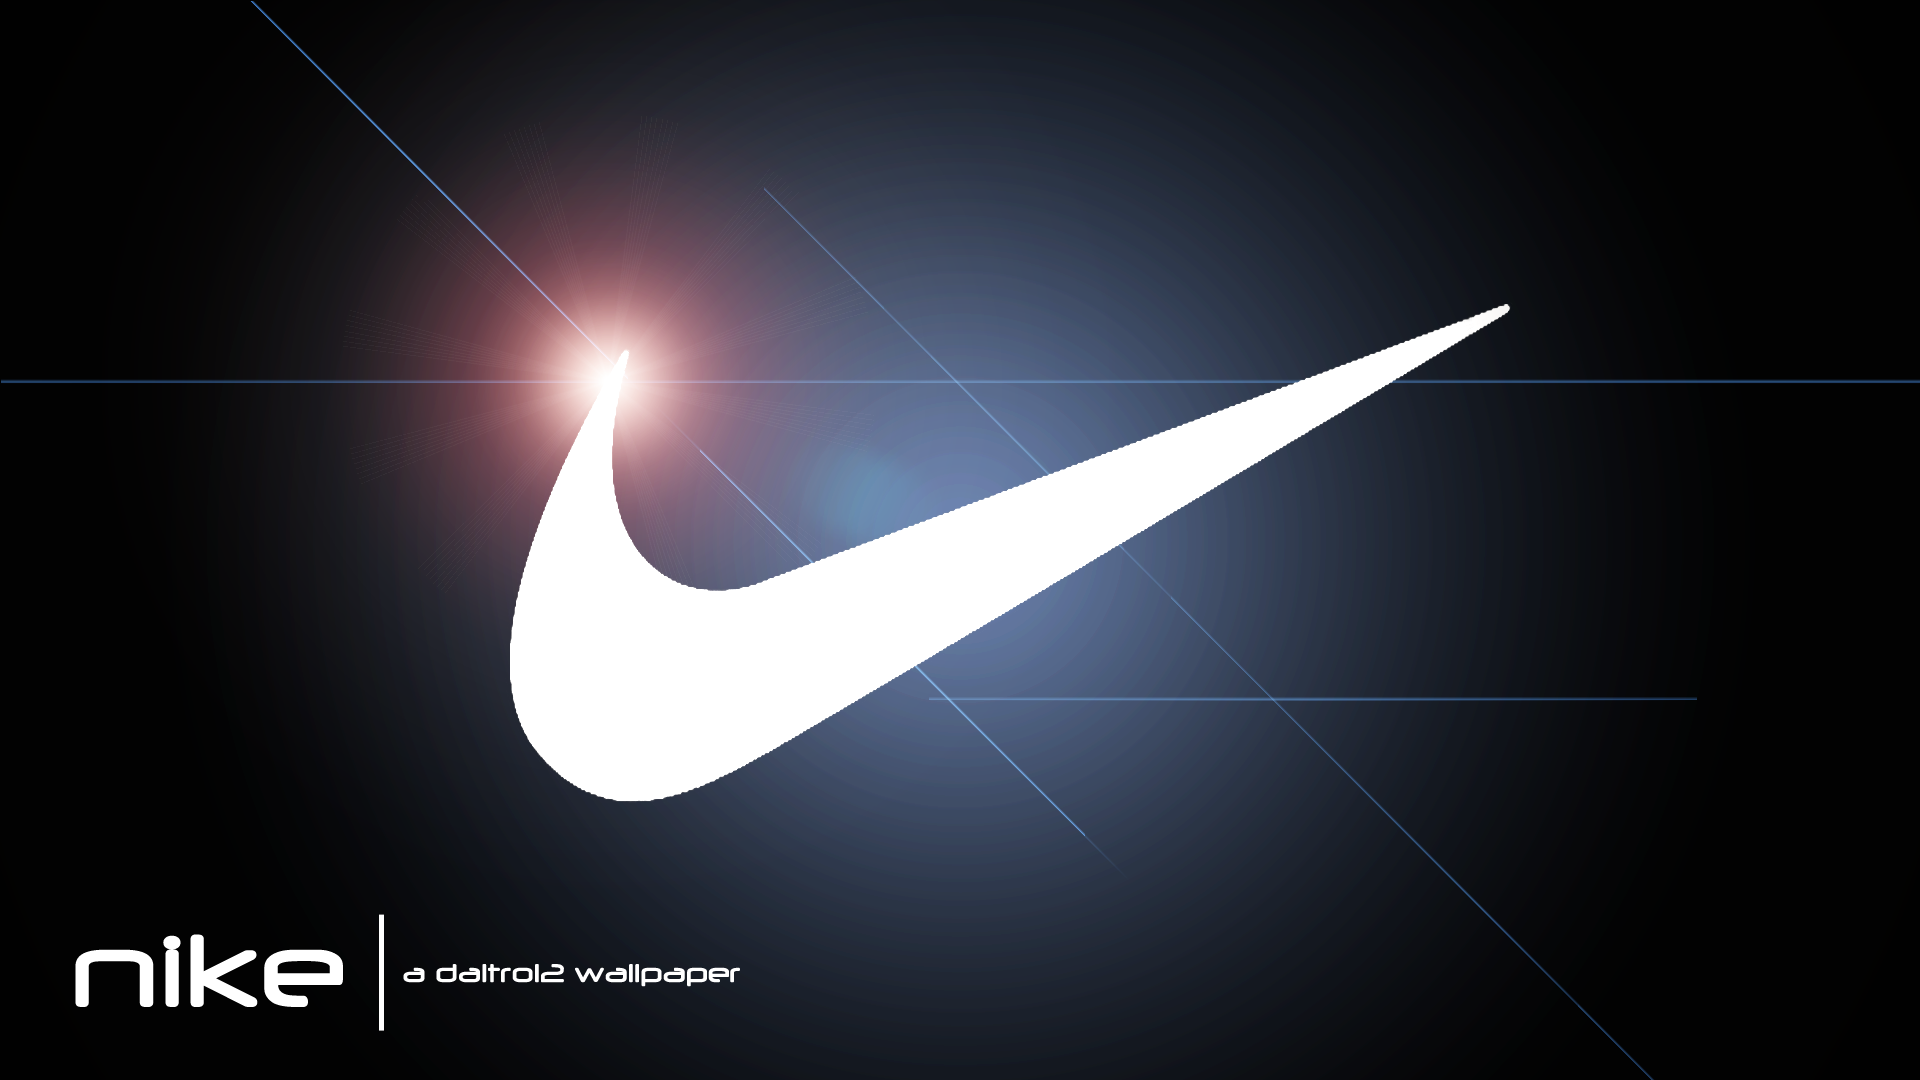 Nike Flow By Antidesigns On Deviantart desktop wallpaper cool nike 1920x1080